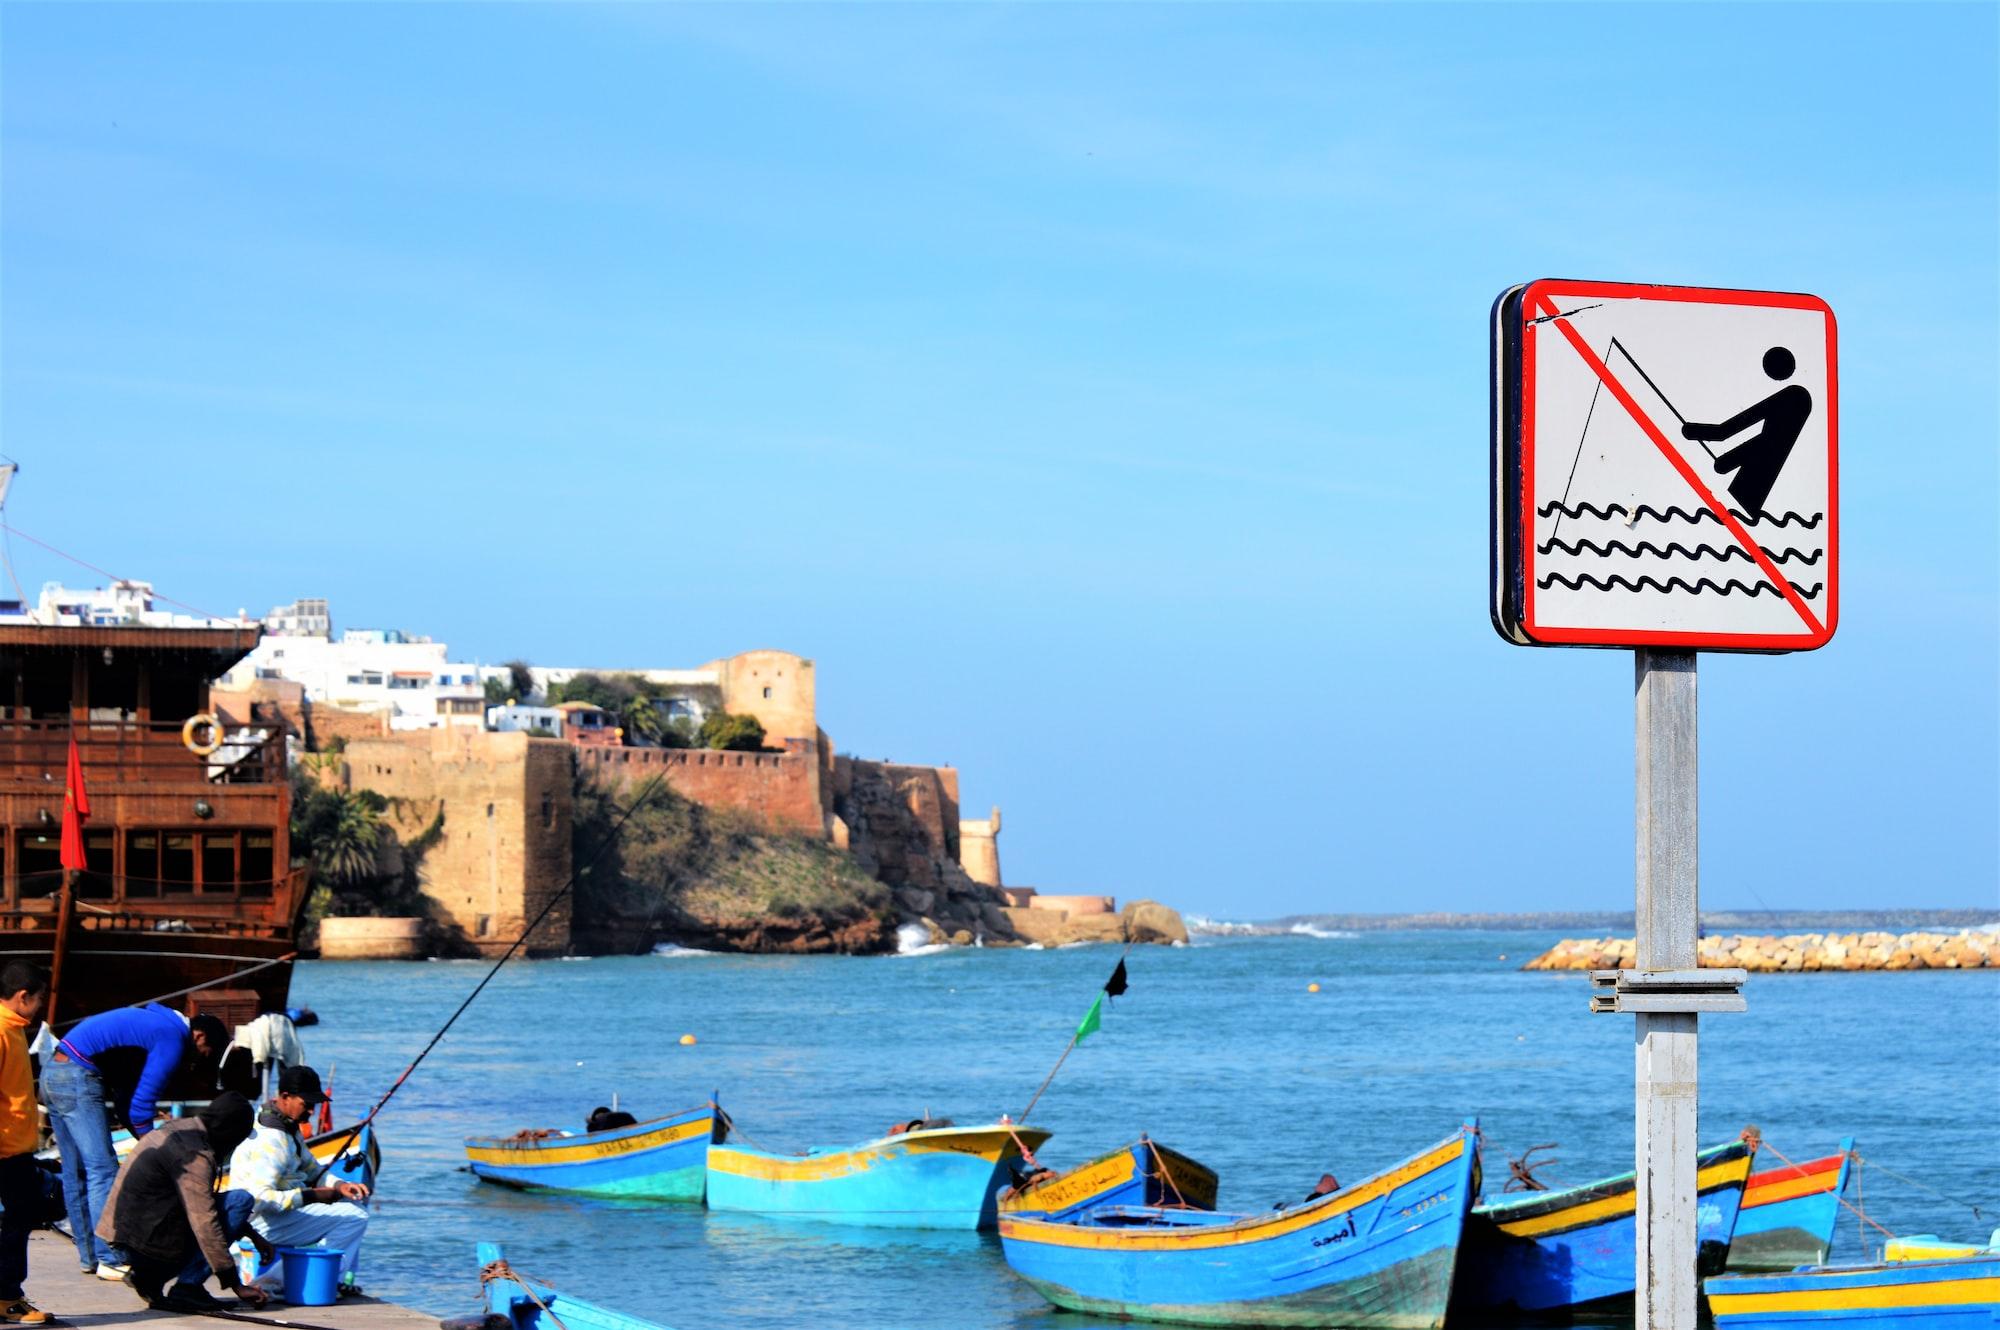 No fishing ... No problem. This photo was taken in Rabat, Morocco